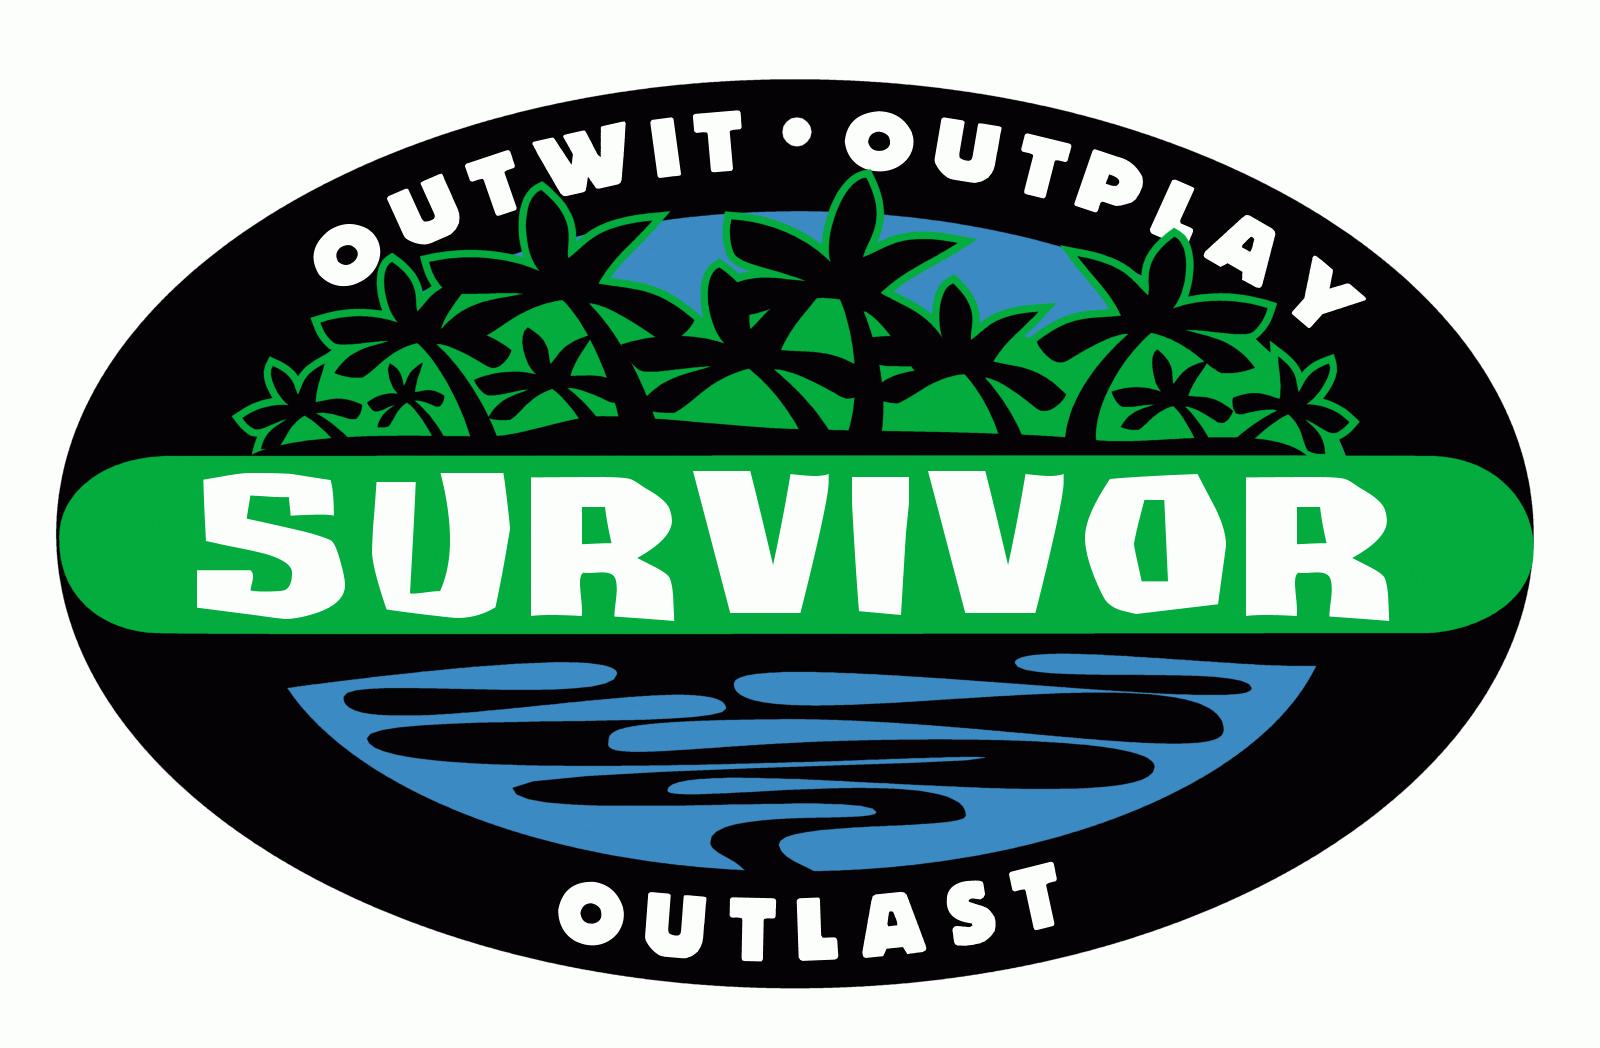 Torch clipart survivor Free logo clipart collection Clip